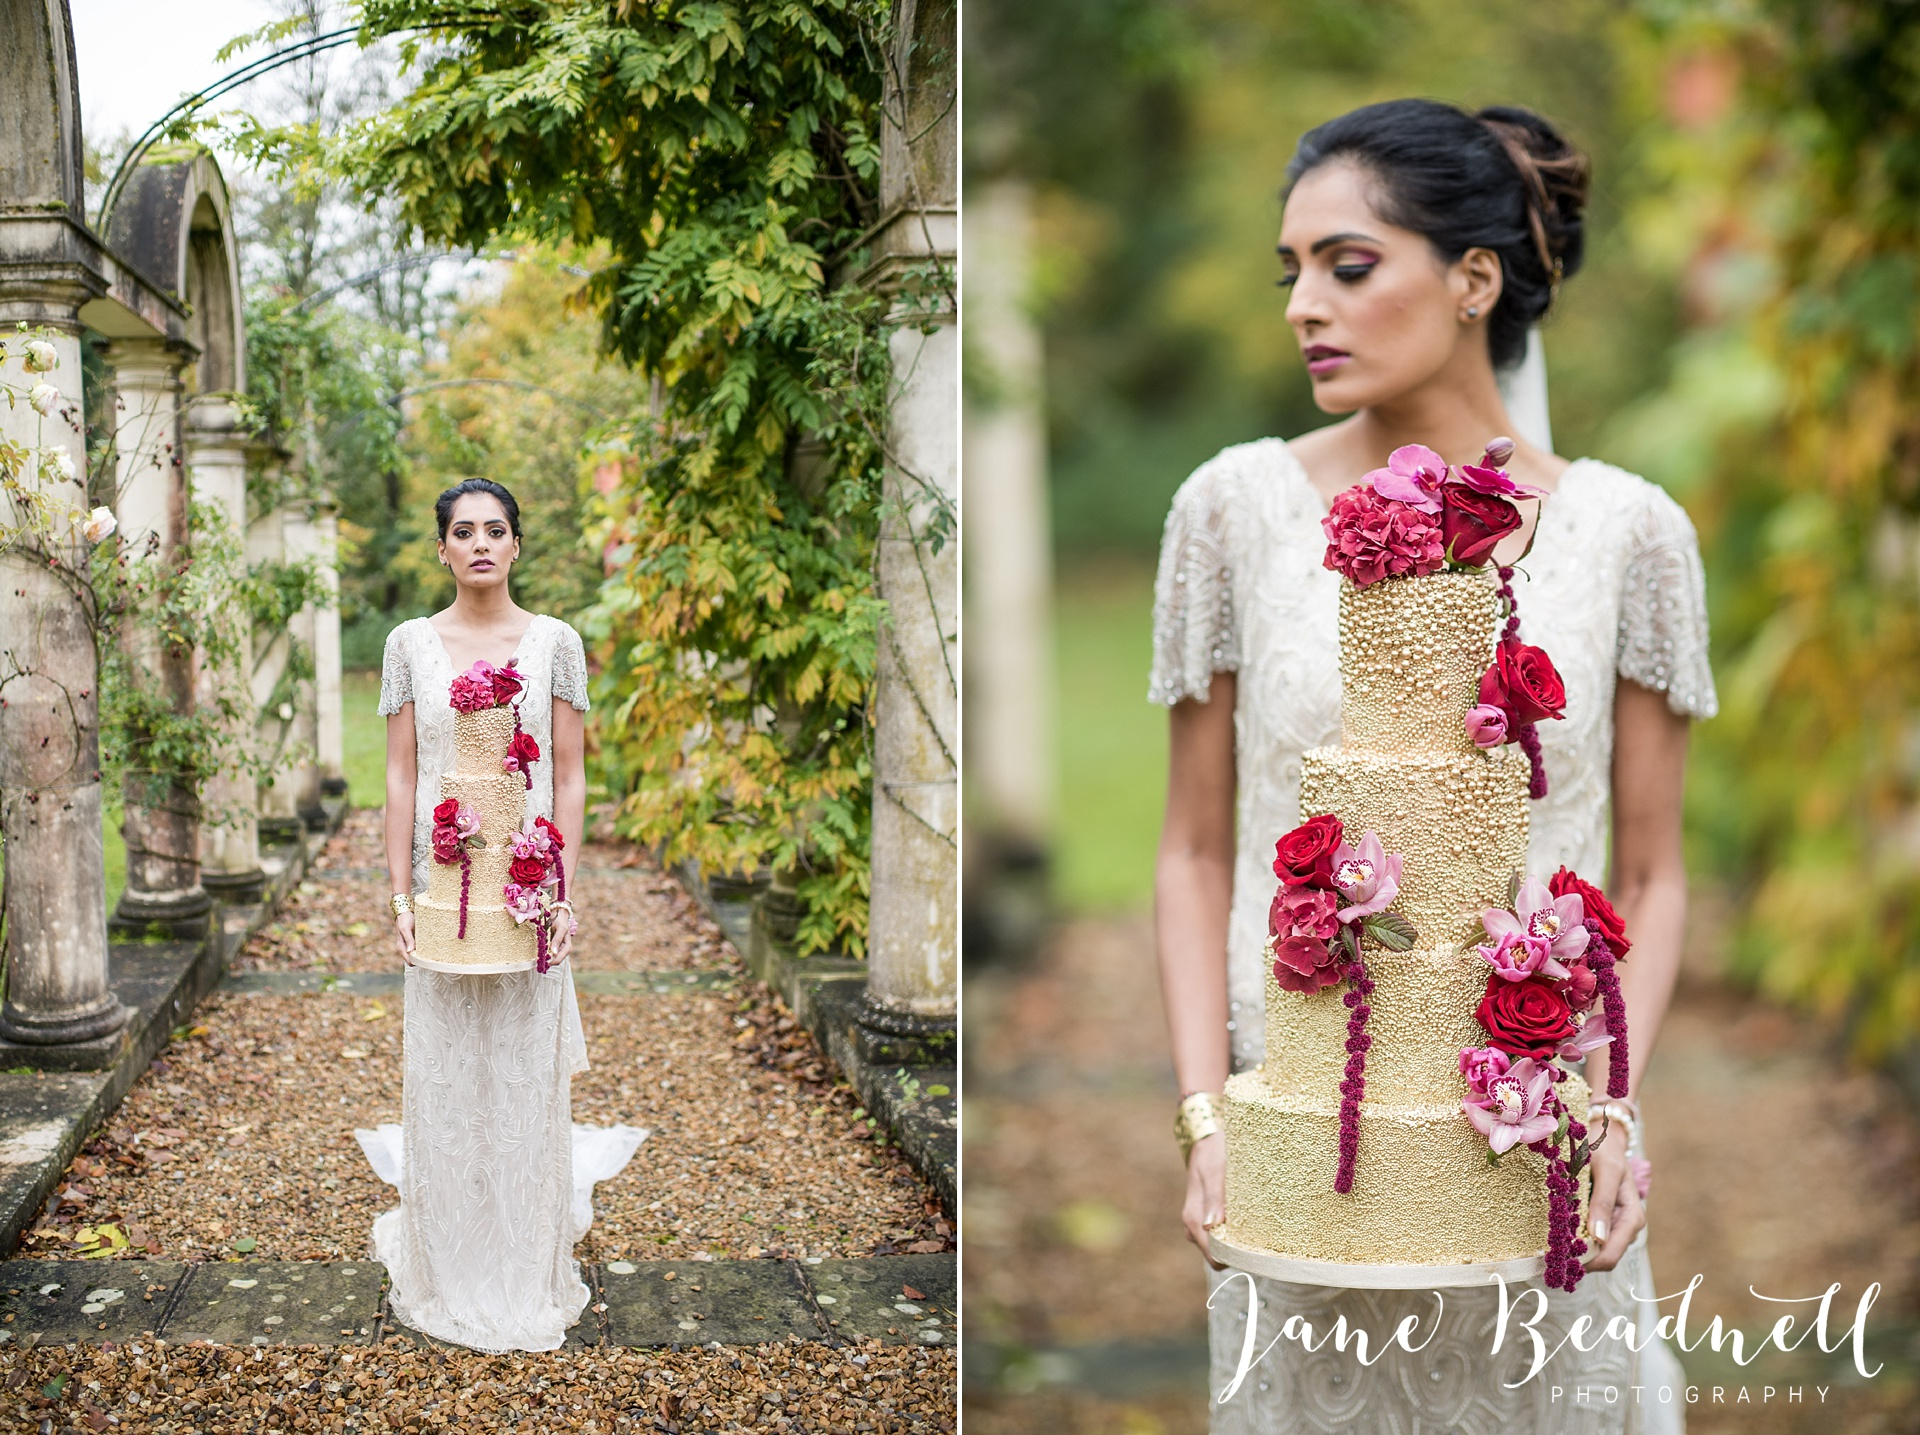 The-Orangery-Gold-Glam-photoshoot-by-Jane-Beadnell-Photography-York_0043.jpg